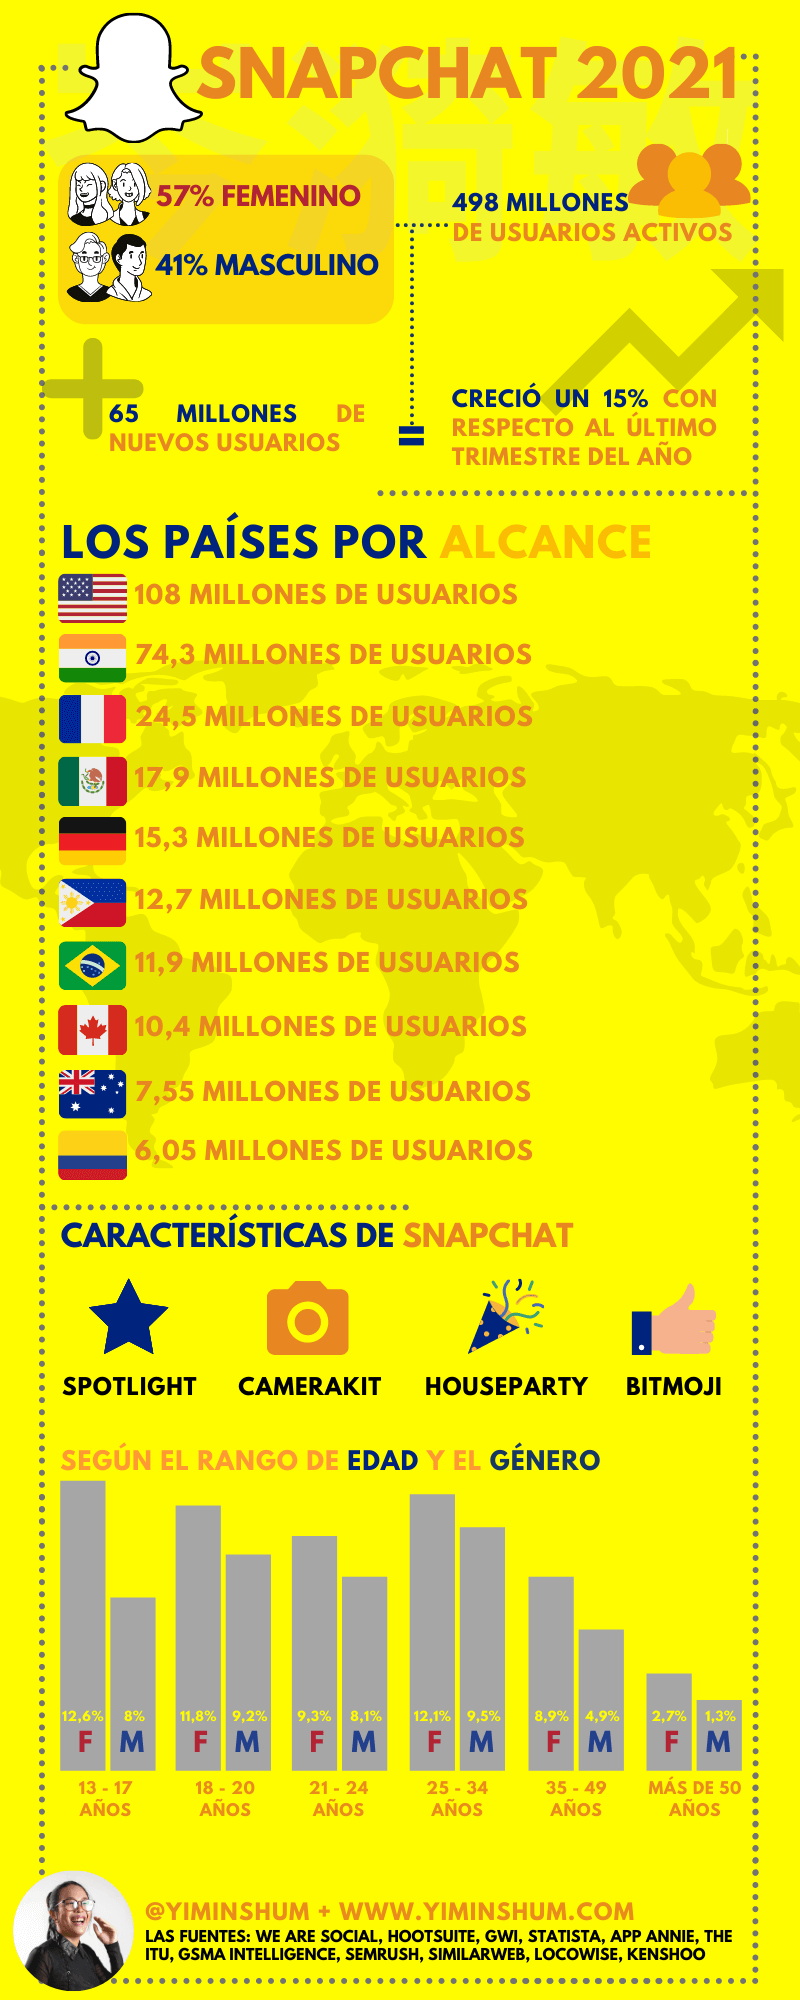 Los datos de Snapchat en 2021 #infografia #infographic #socialmedia